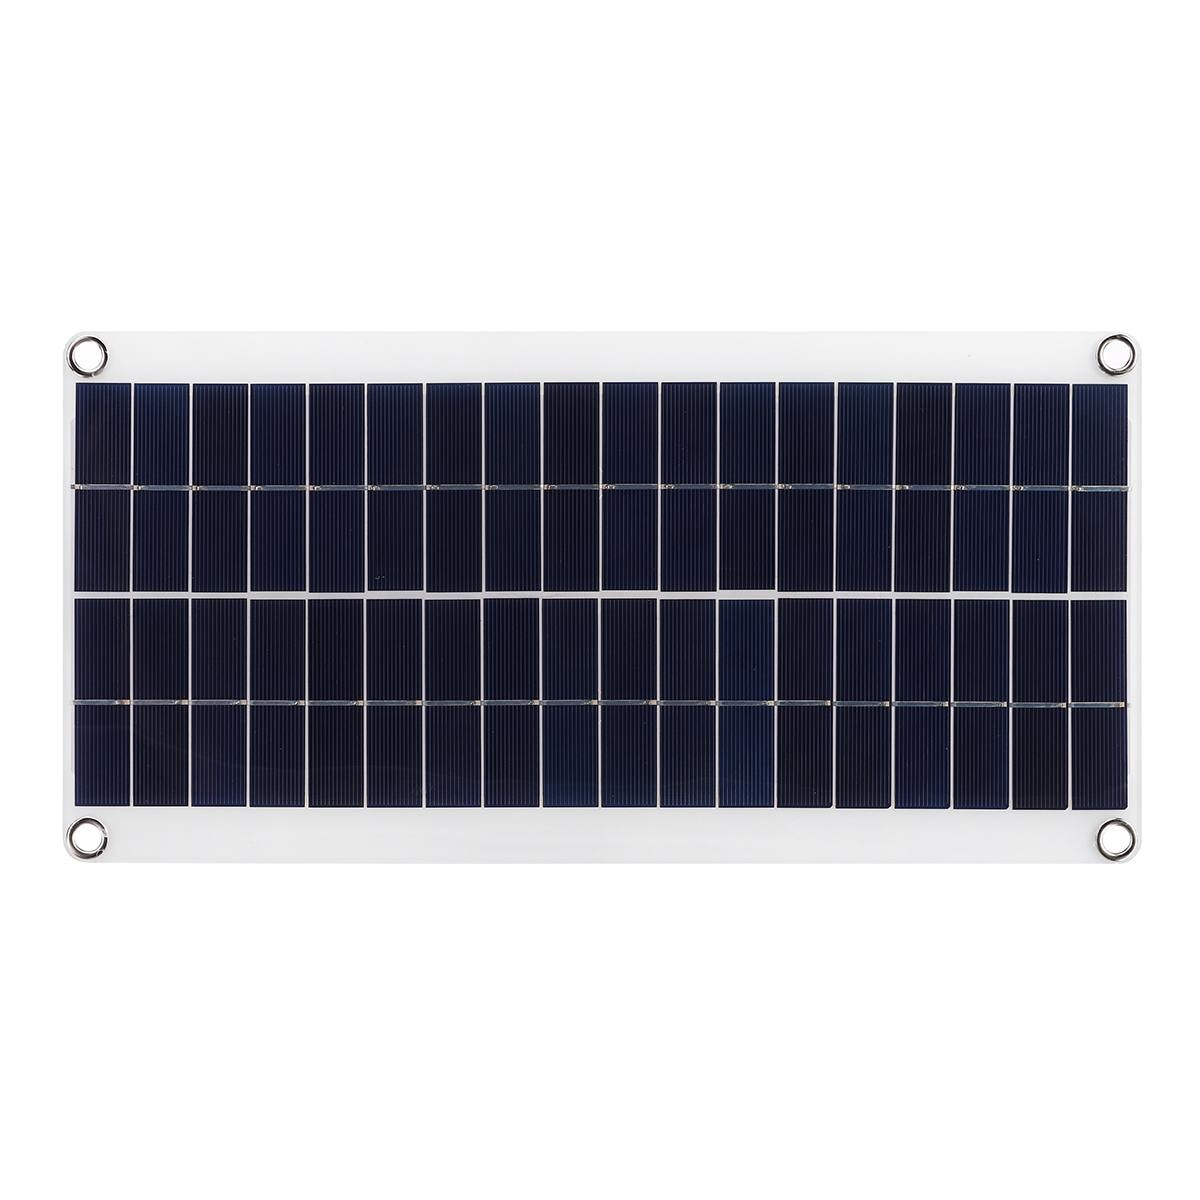 Cargador de batería de Panel Solar portátil de 60W DC 18V, tablero de células solares con pinzas de cocodrilo, cargador de coche para teléfono RV, coche, 411X200X2.5MM